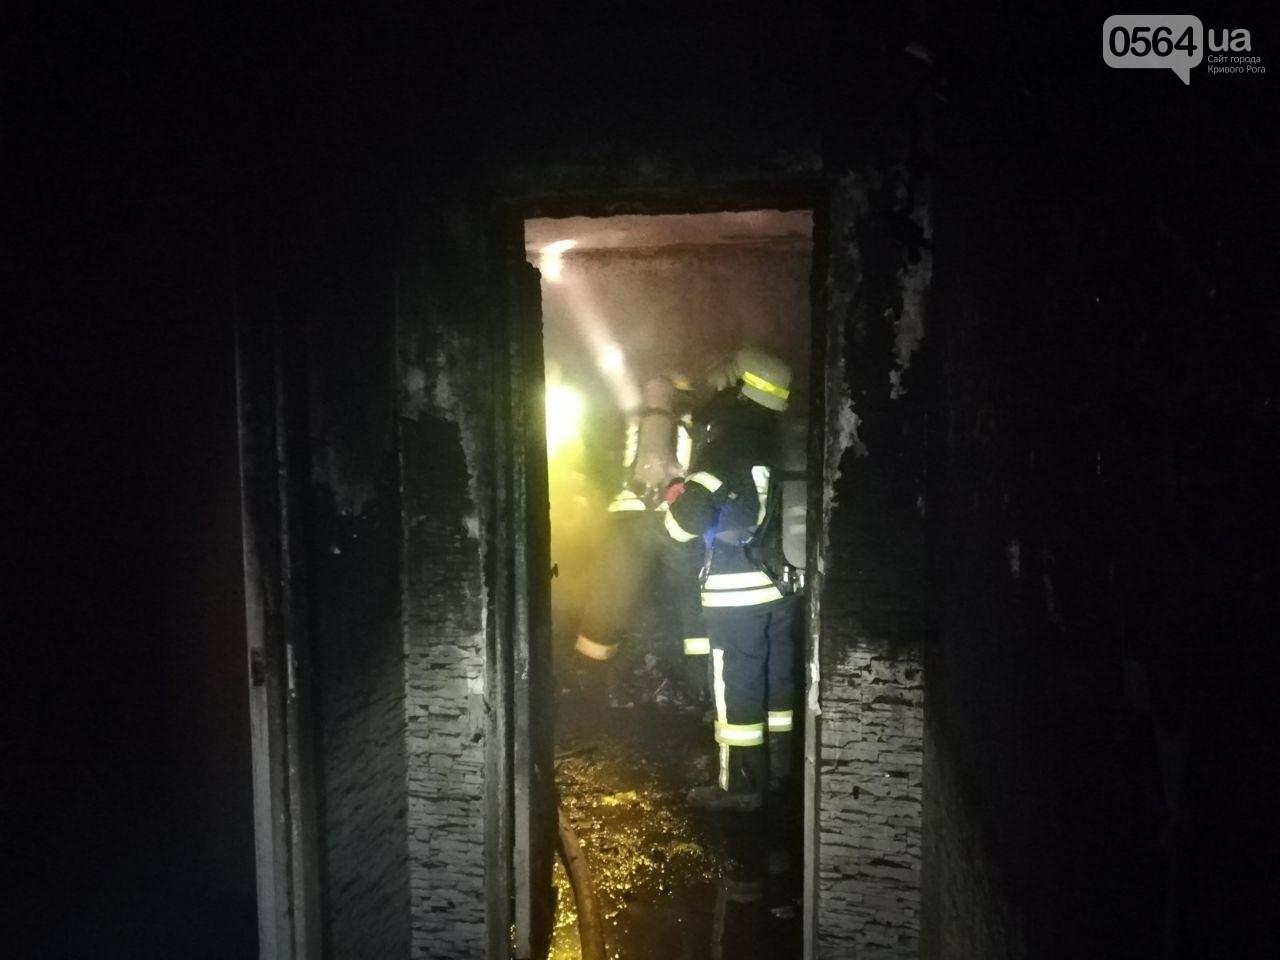 В Кривом Роге загорелась квартира на 6 этаже. Найдено тело мужчины, - ФОТО 18+, ВИДЕО, ОБНОВЛЕНО, фото-6